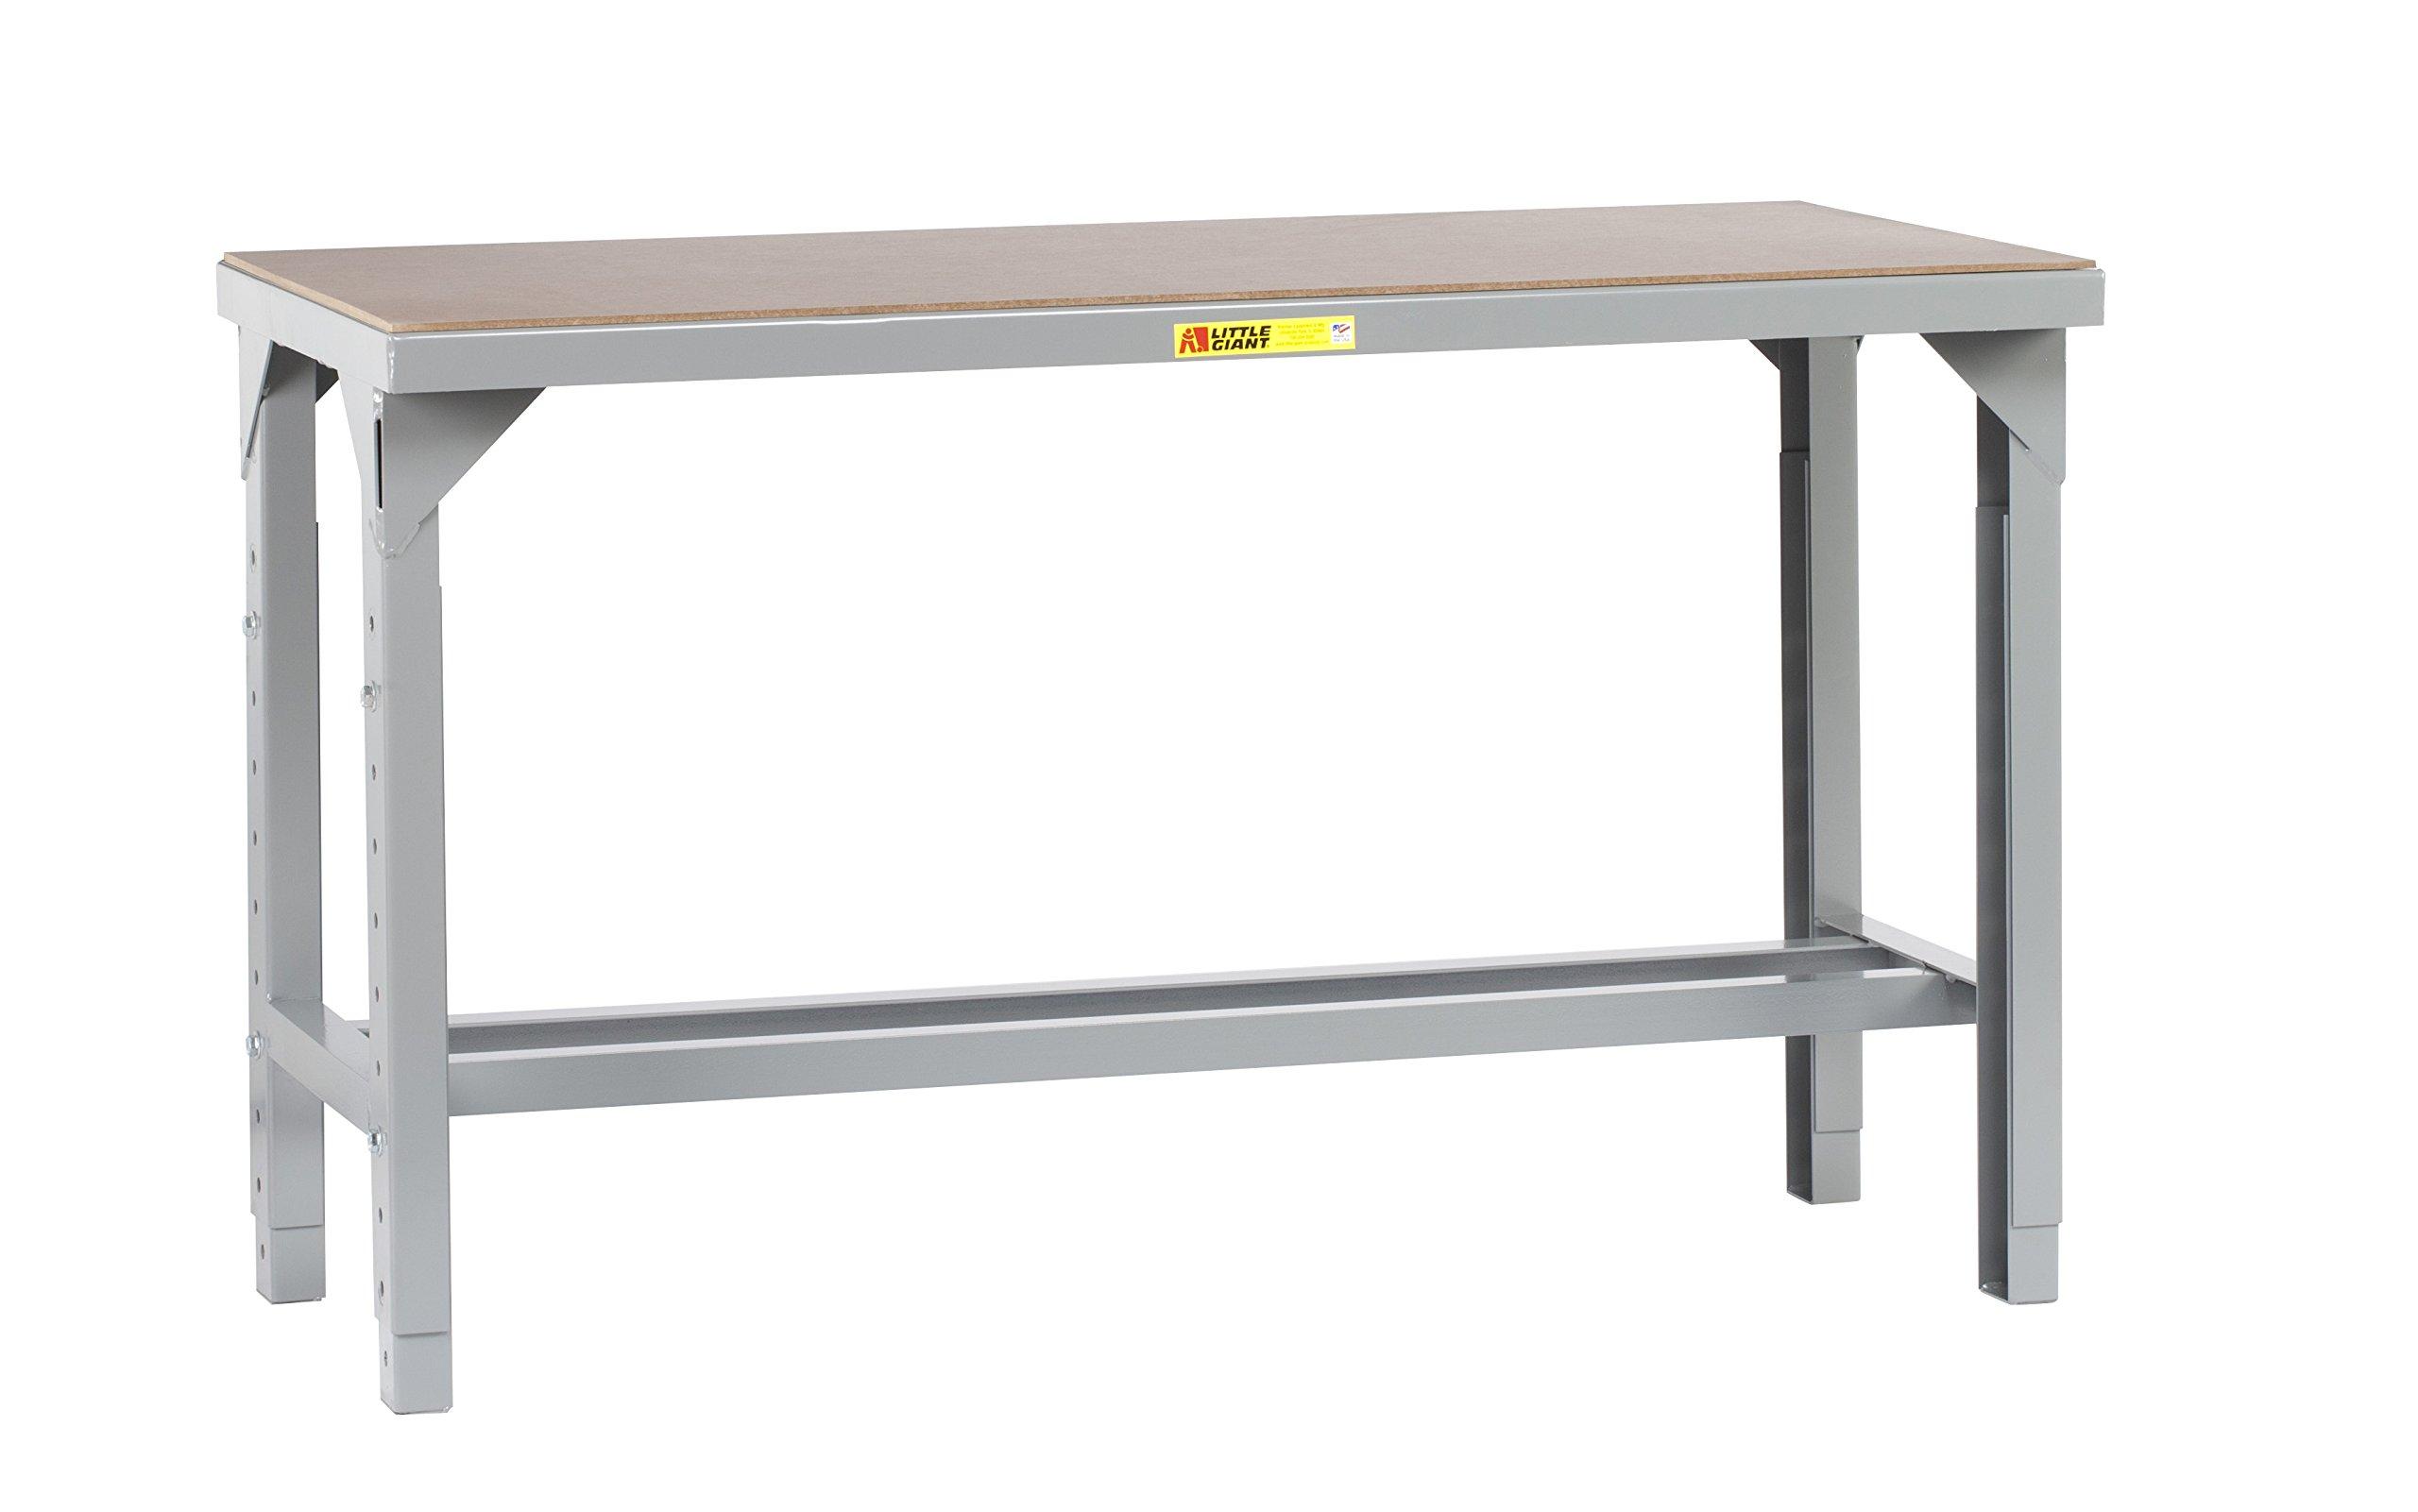 Little Giant WSH1-3048-AH Welded Steel Workbench, Hardboard over Steel Top, Open Base5000 lb. Load Capacity, 27'' - 41'' Adjustable Height x 48'' x 30'', Gray